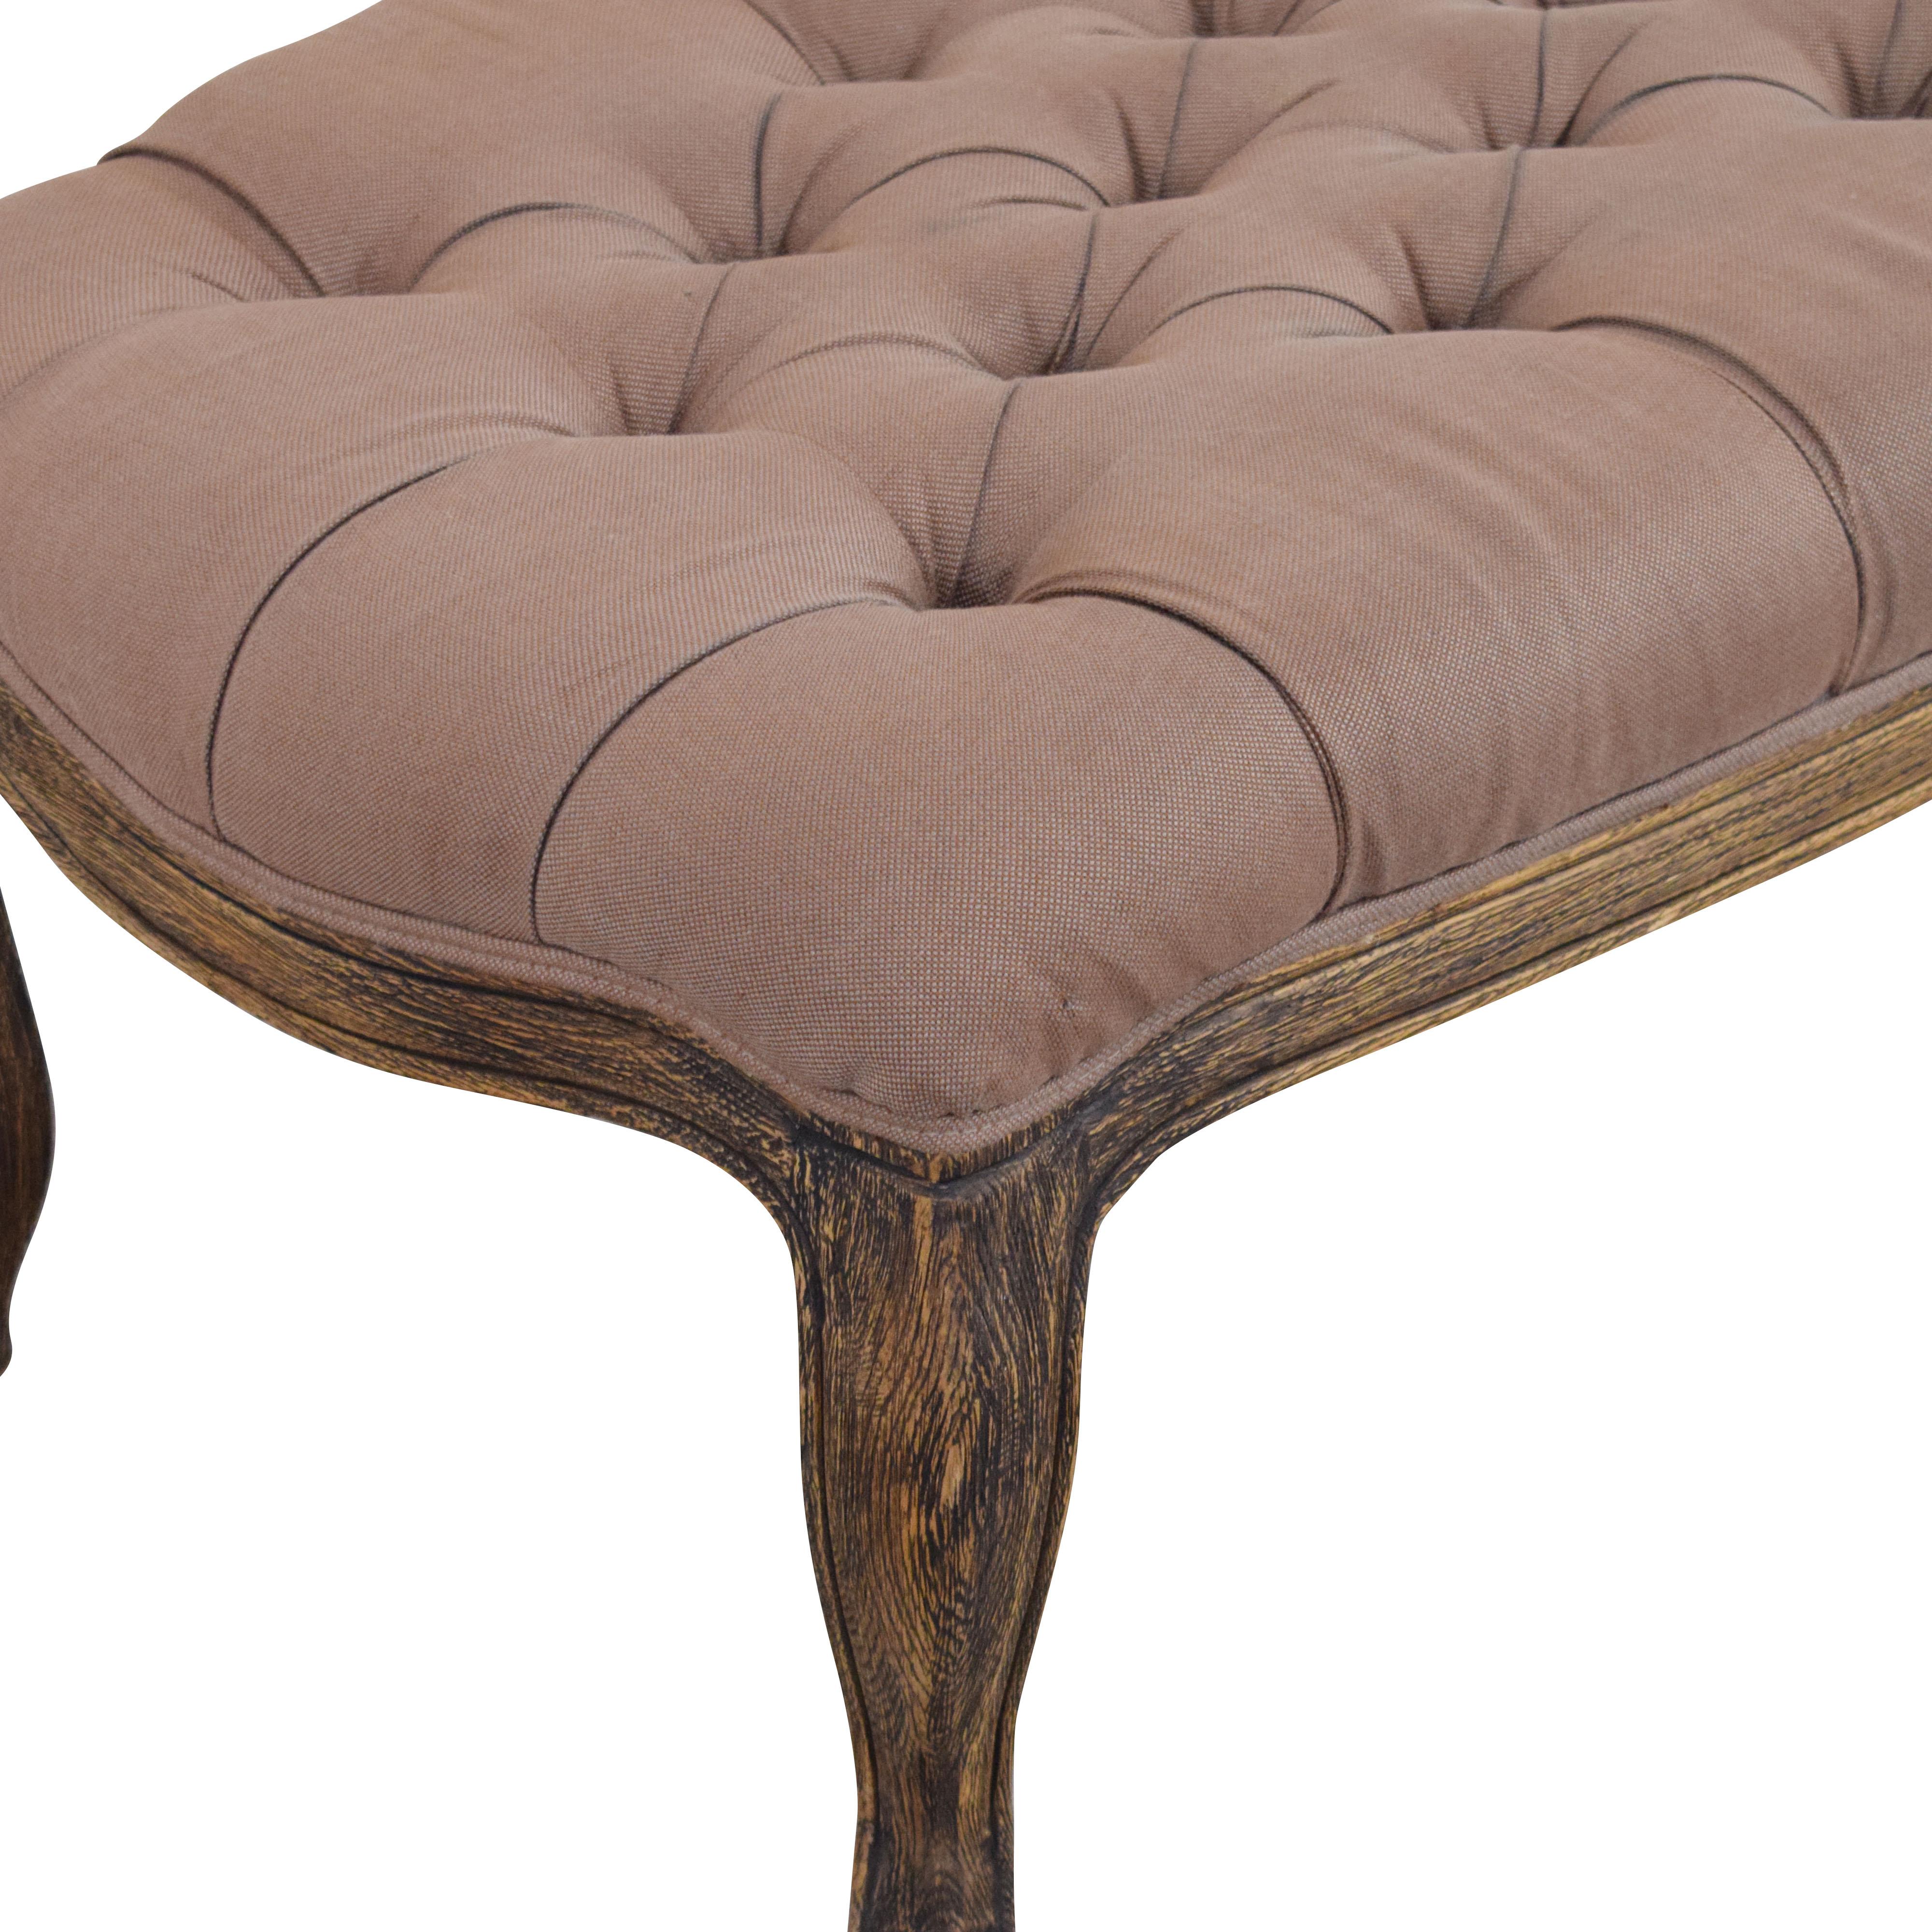 Wayfair Wayfair Bella Collection Ottoman price